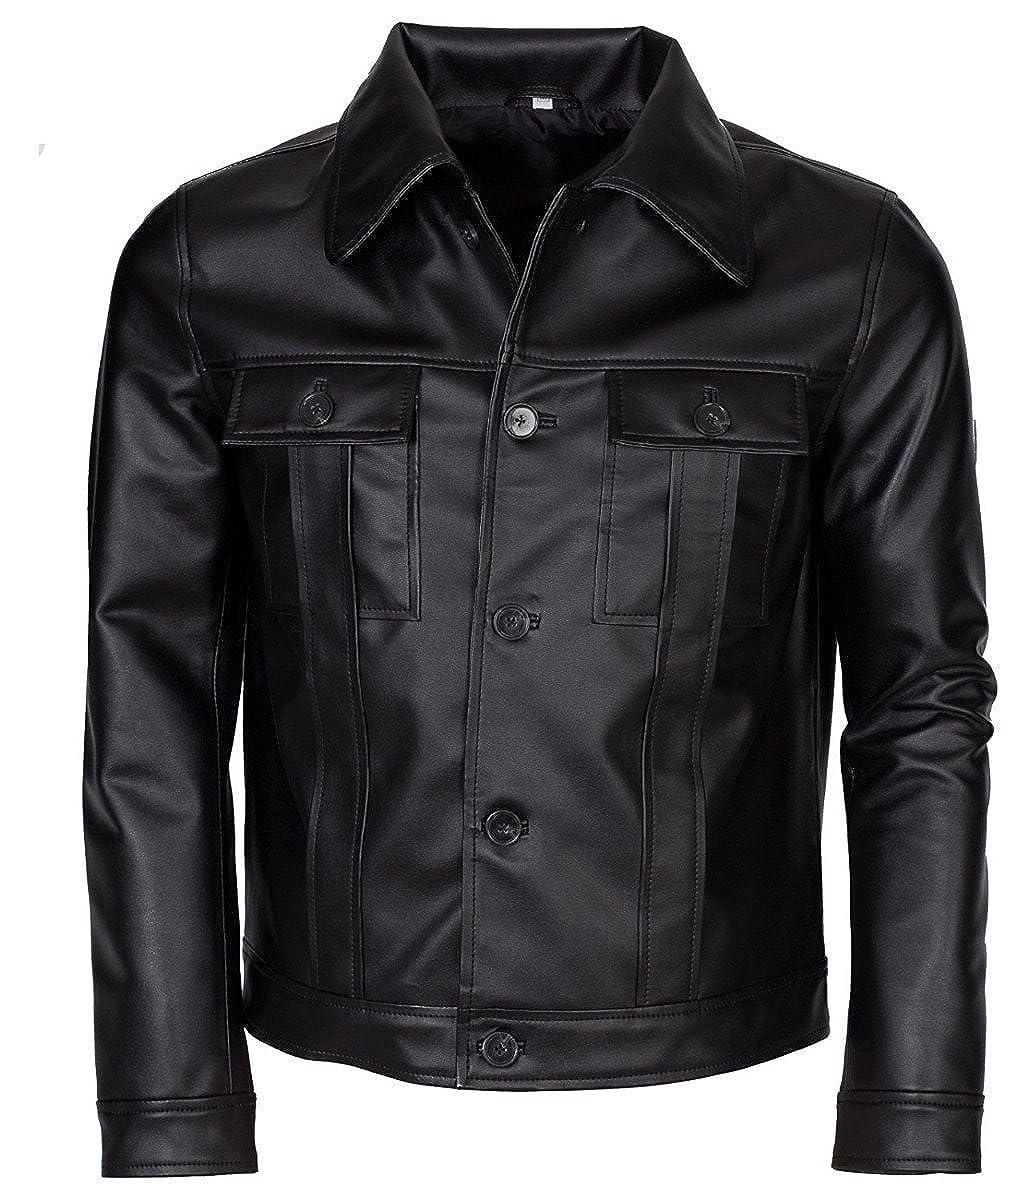 Feather Skin Elvis Presley Inspired Black Rockstar Genuine Leather Jacket